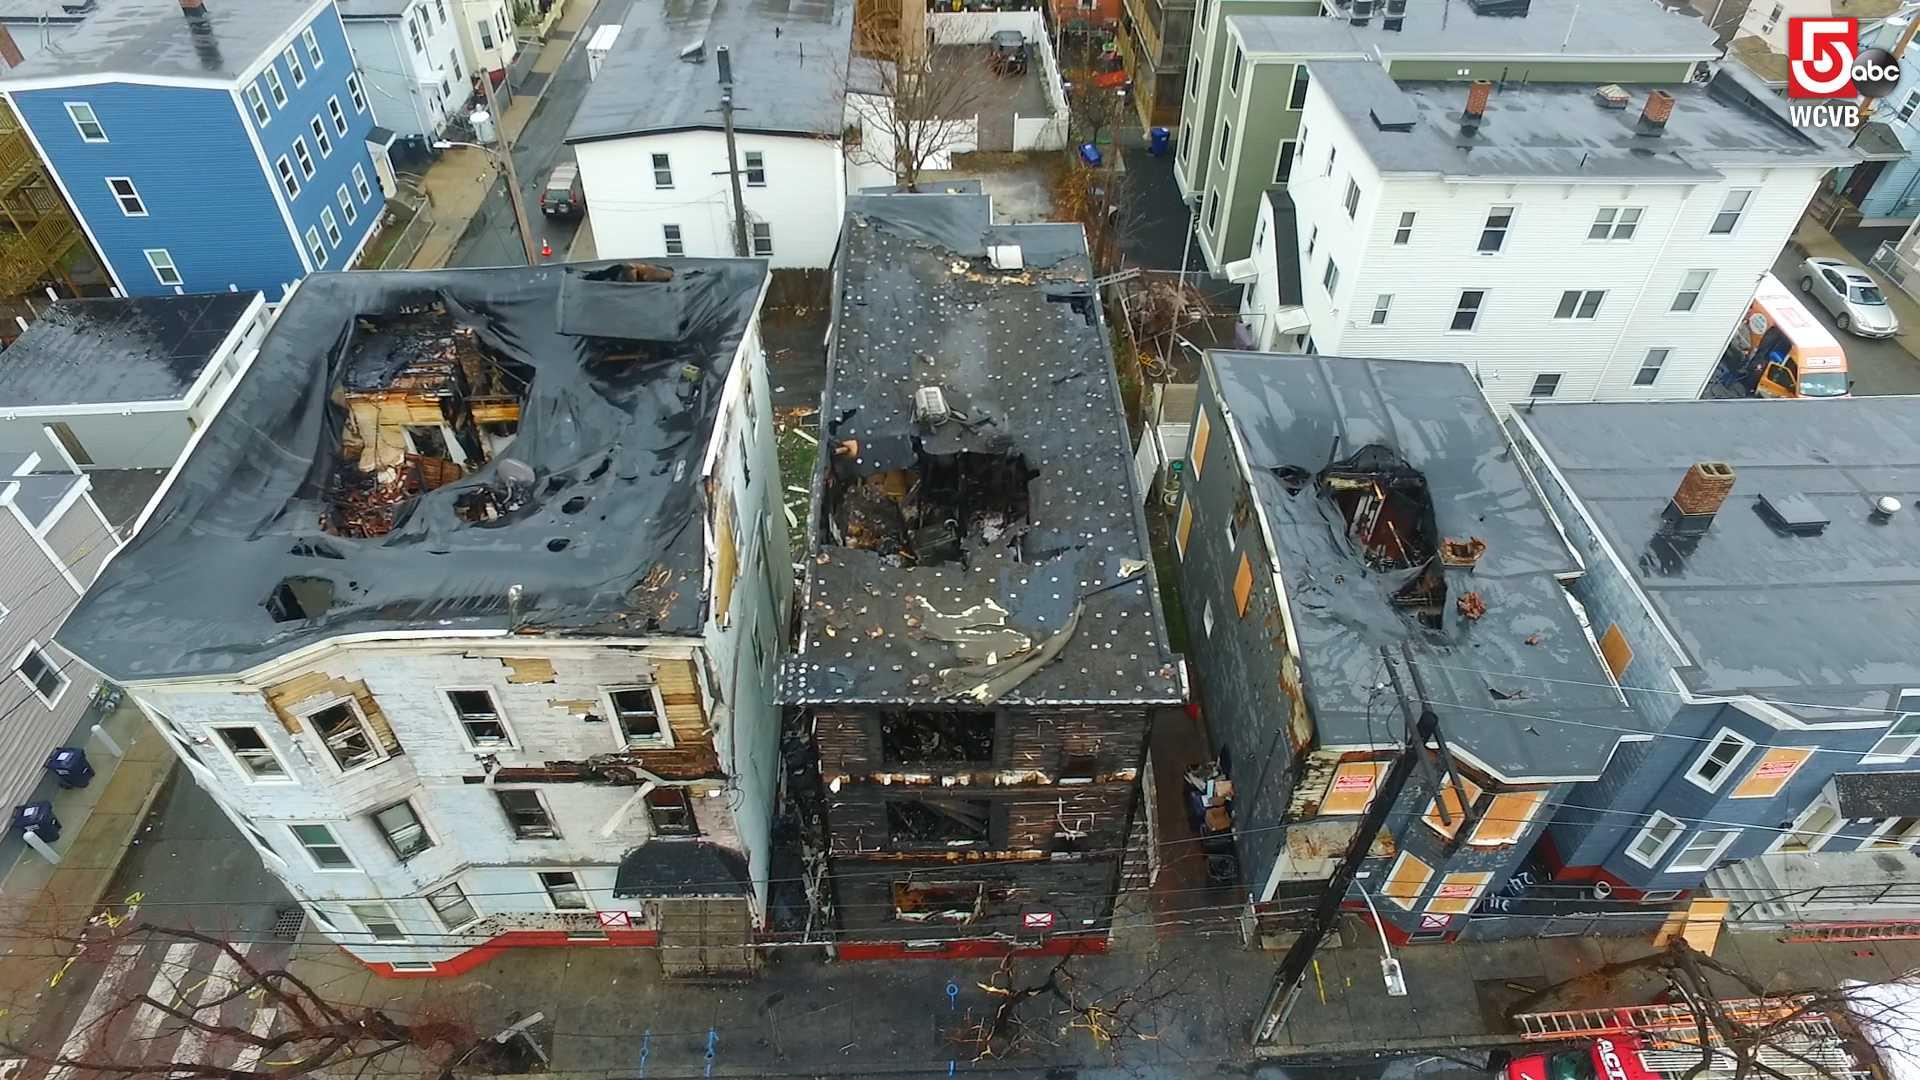 Drone 5 over Cambridge damage